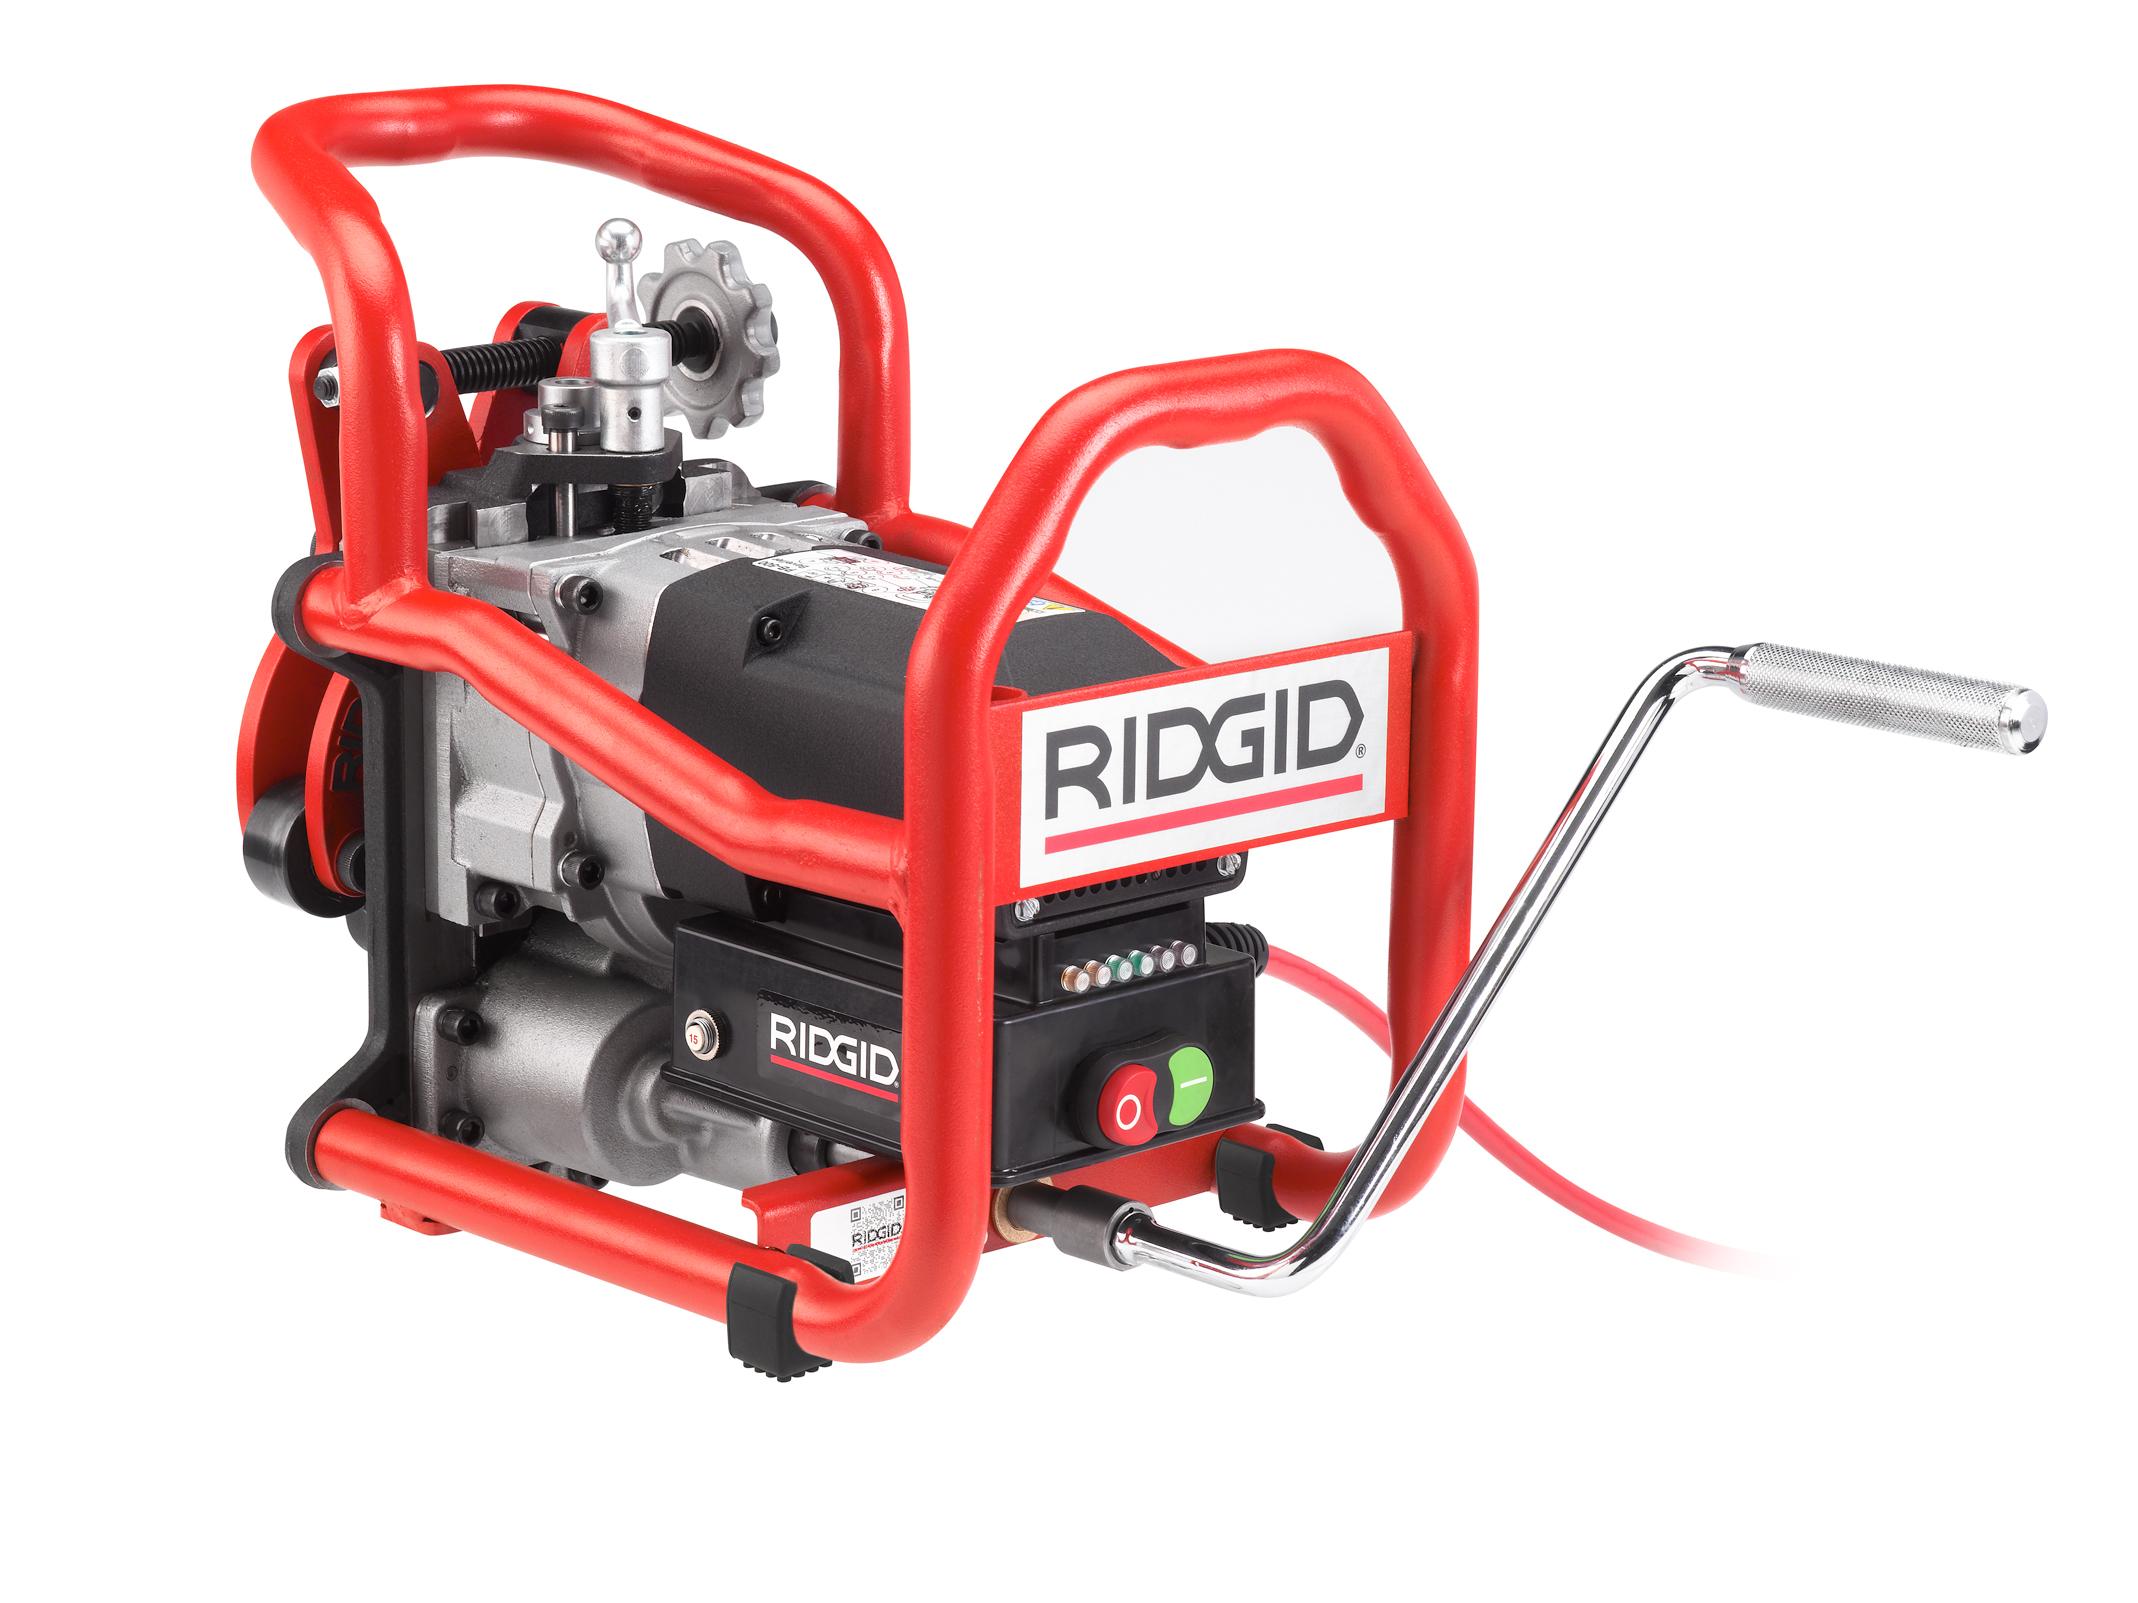 RIDGID 49298 - B-500 Transportable Pipe Beveller w/371/2° Cutter Head 110v